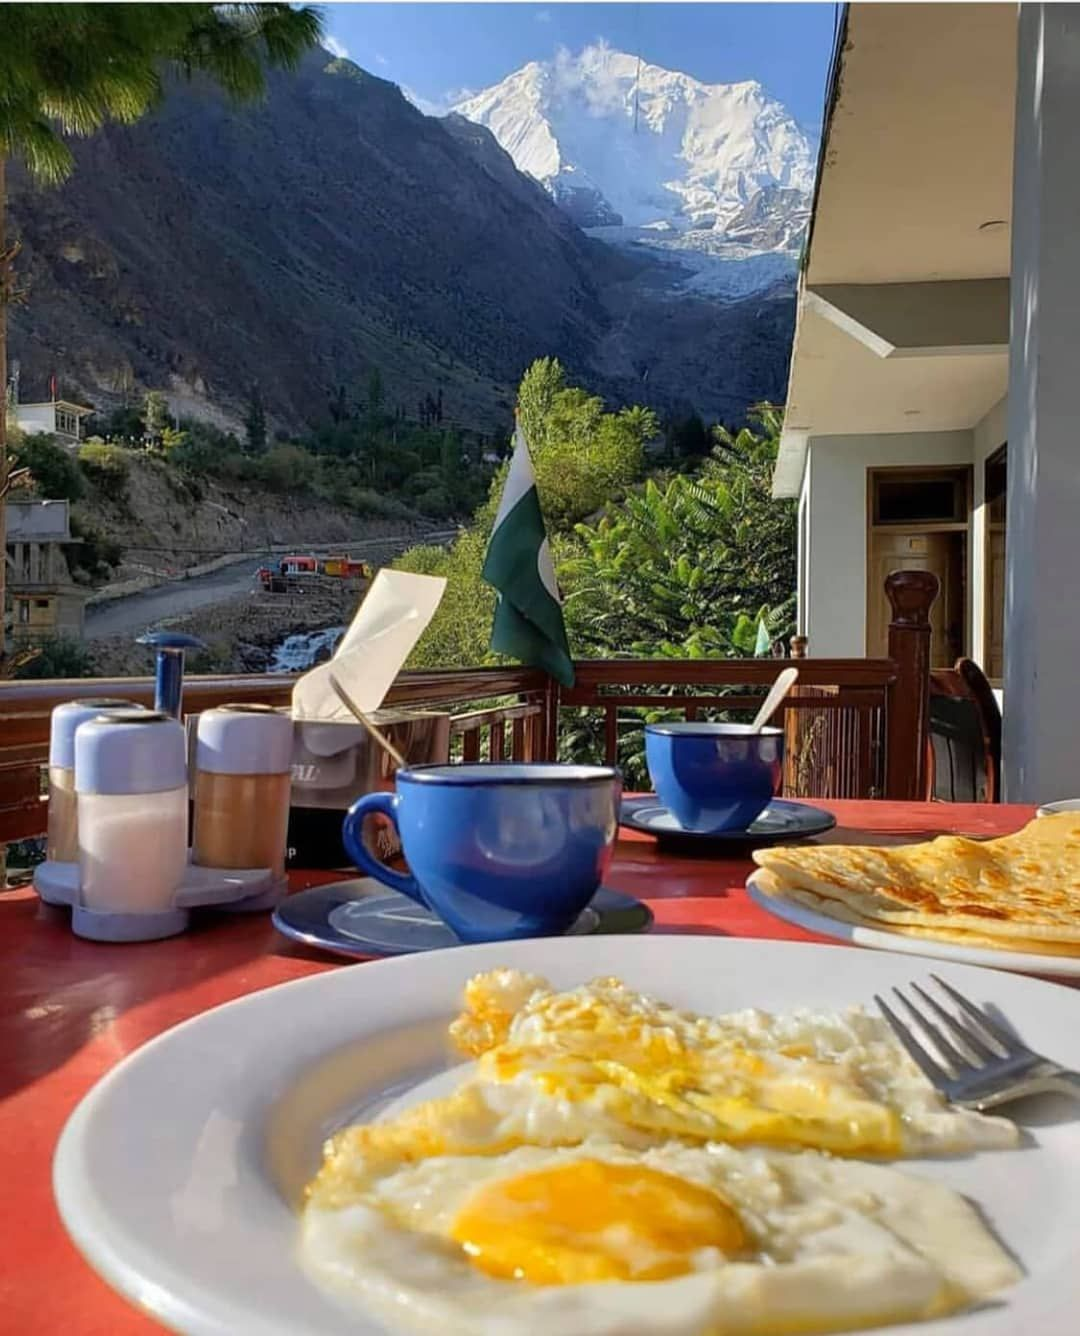 #breakfast  #morning #mountain #clouds #eggs #omlette #tea #canon #camping #Hunza #gilgit #khunjerabpass #paradise #... #cloudeggs